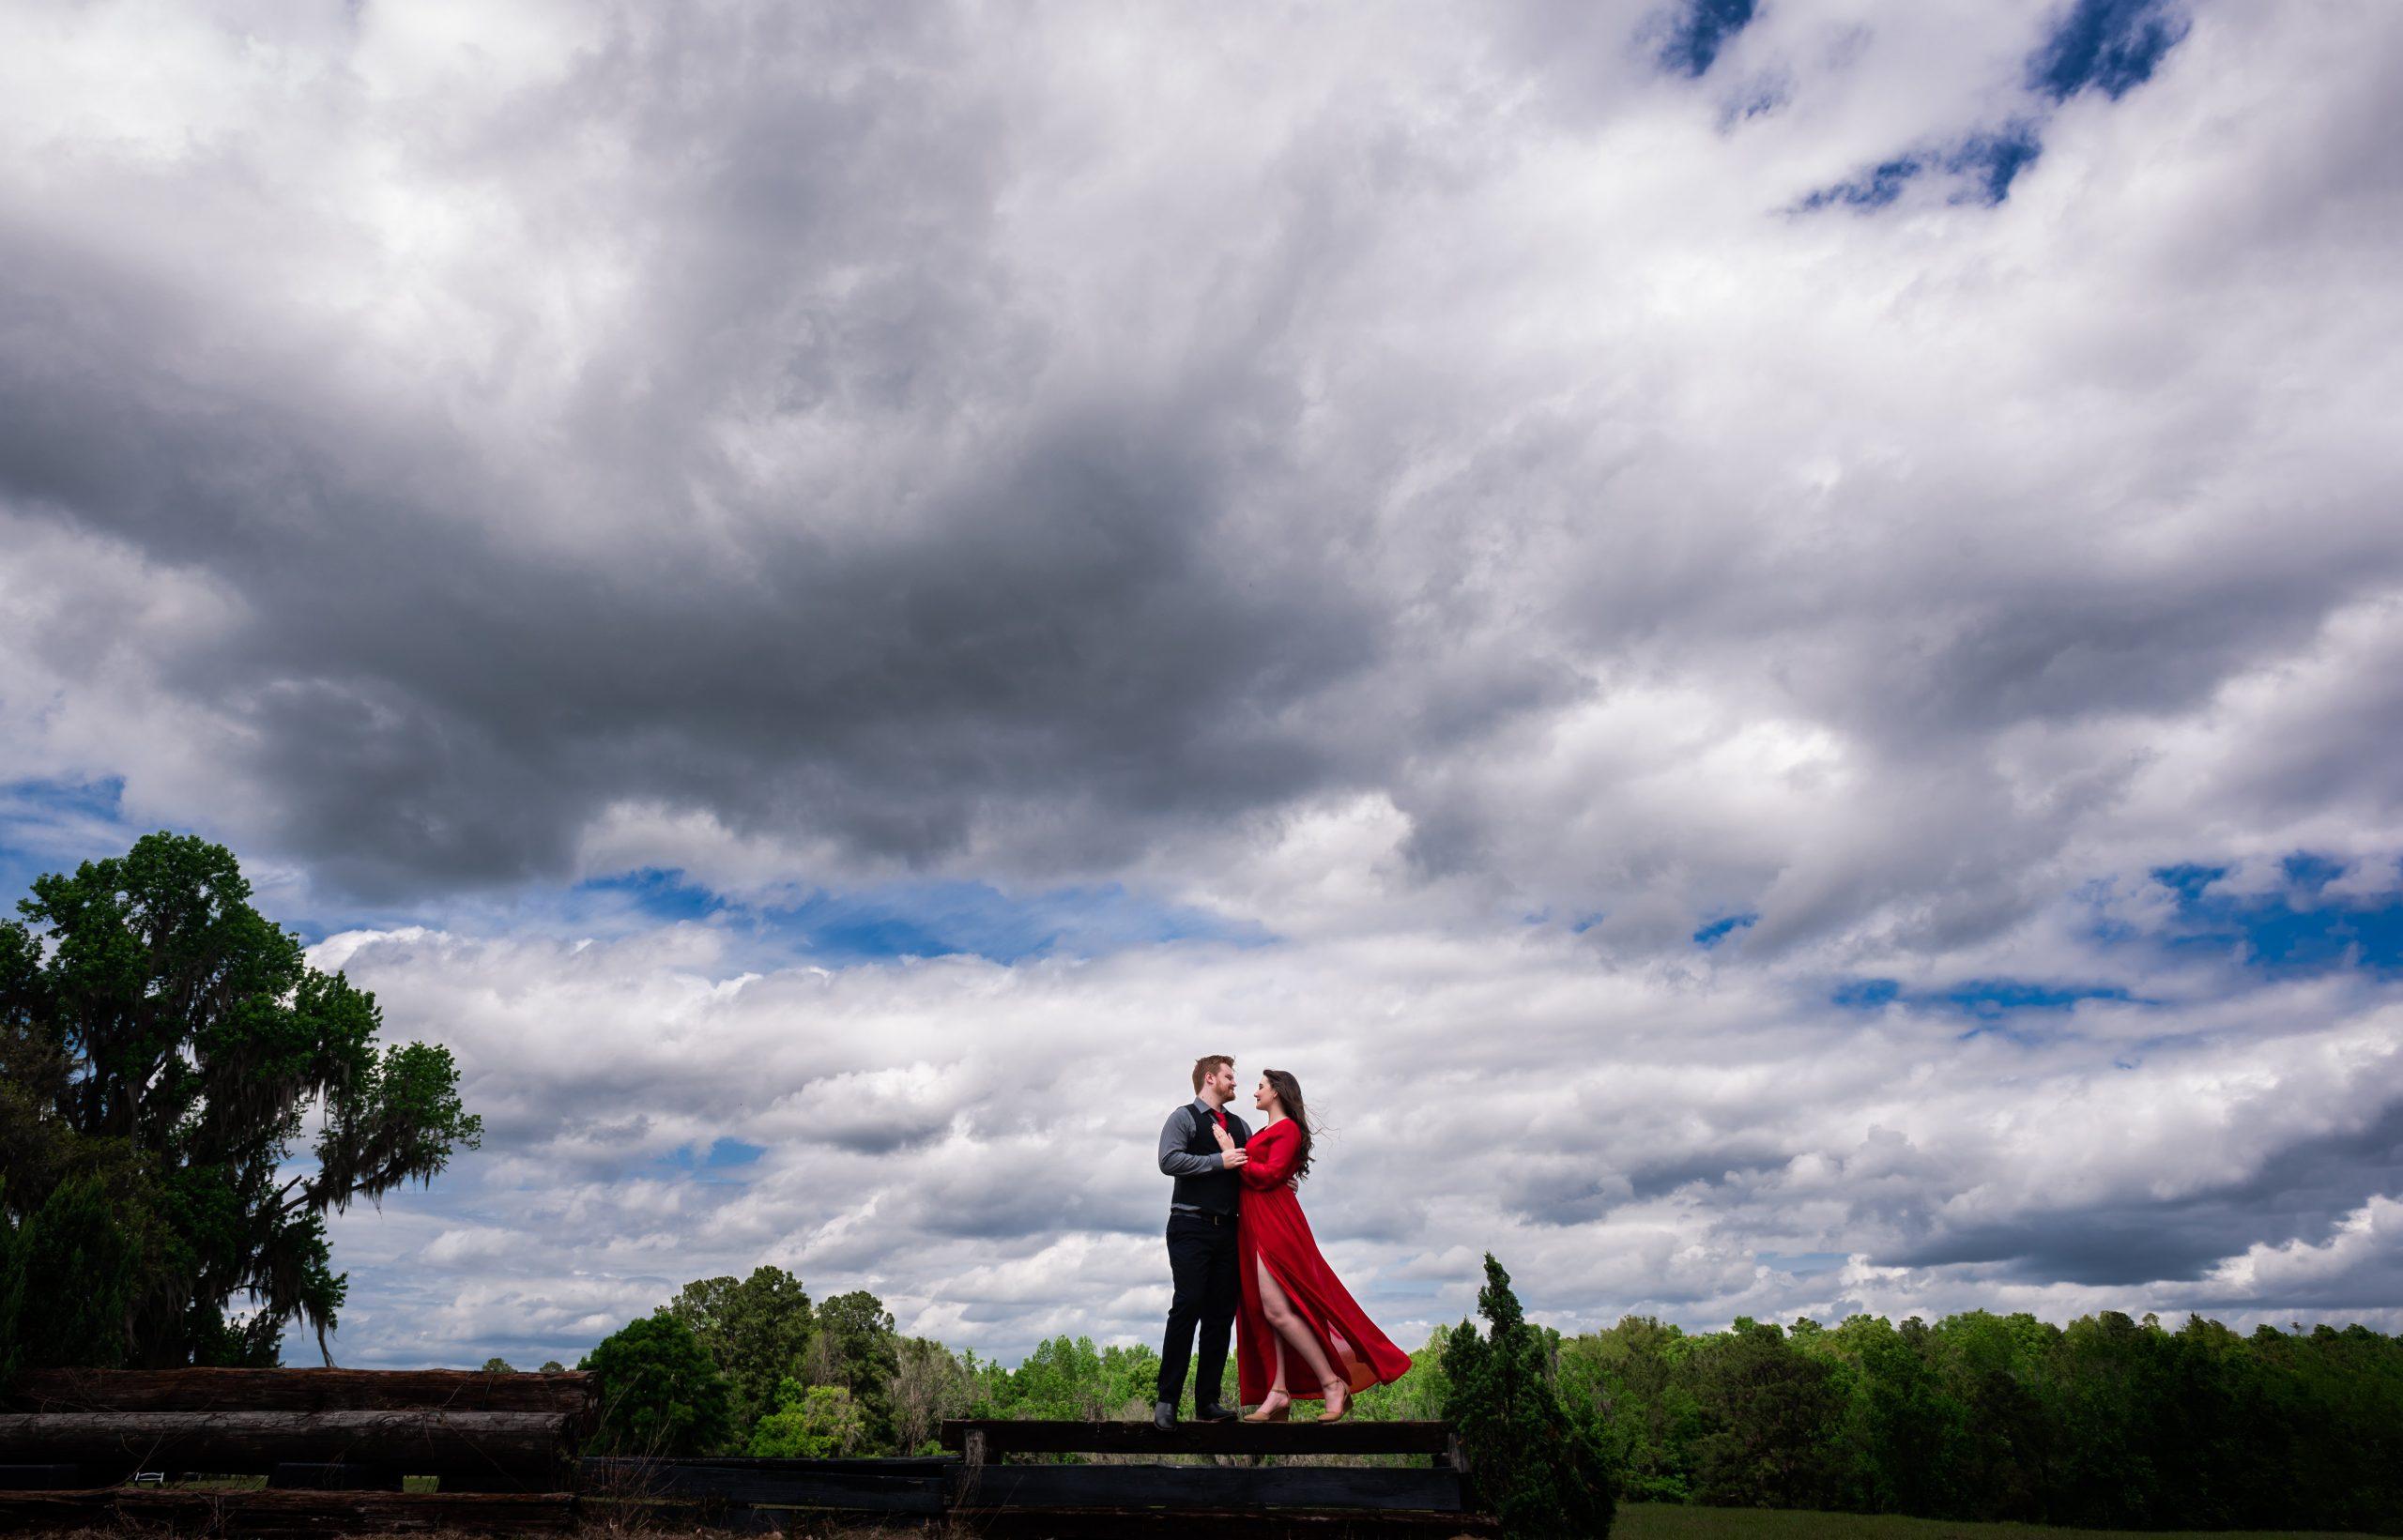 Family couples engagement photography fine art portrait photographer water bear photography studio Gainesville Florida USA